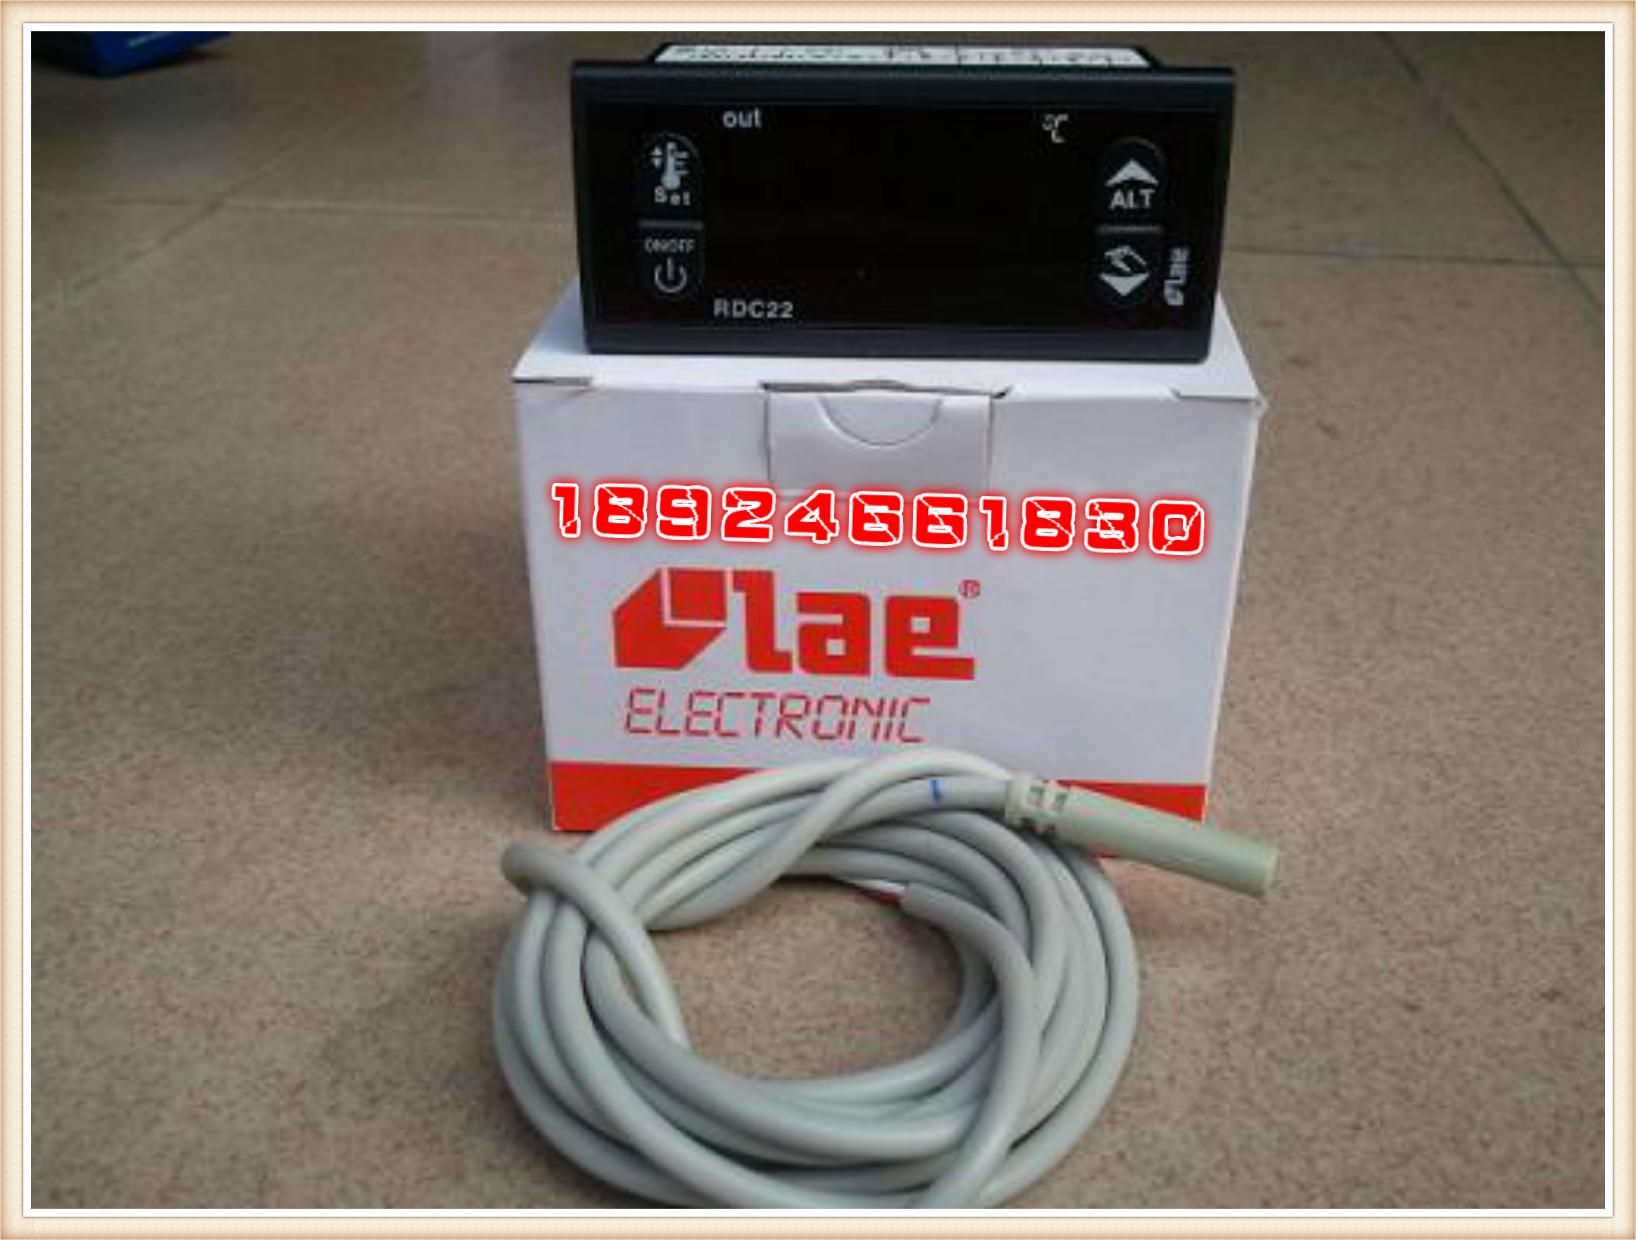 RDC22 delta chiller chiller thermostat temperature control meter  #B71B14